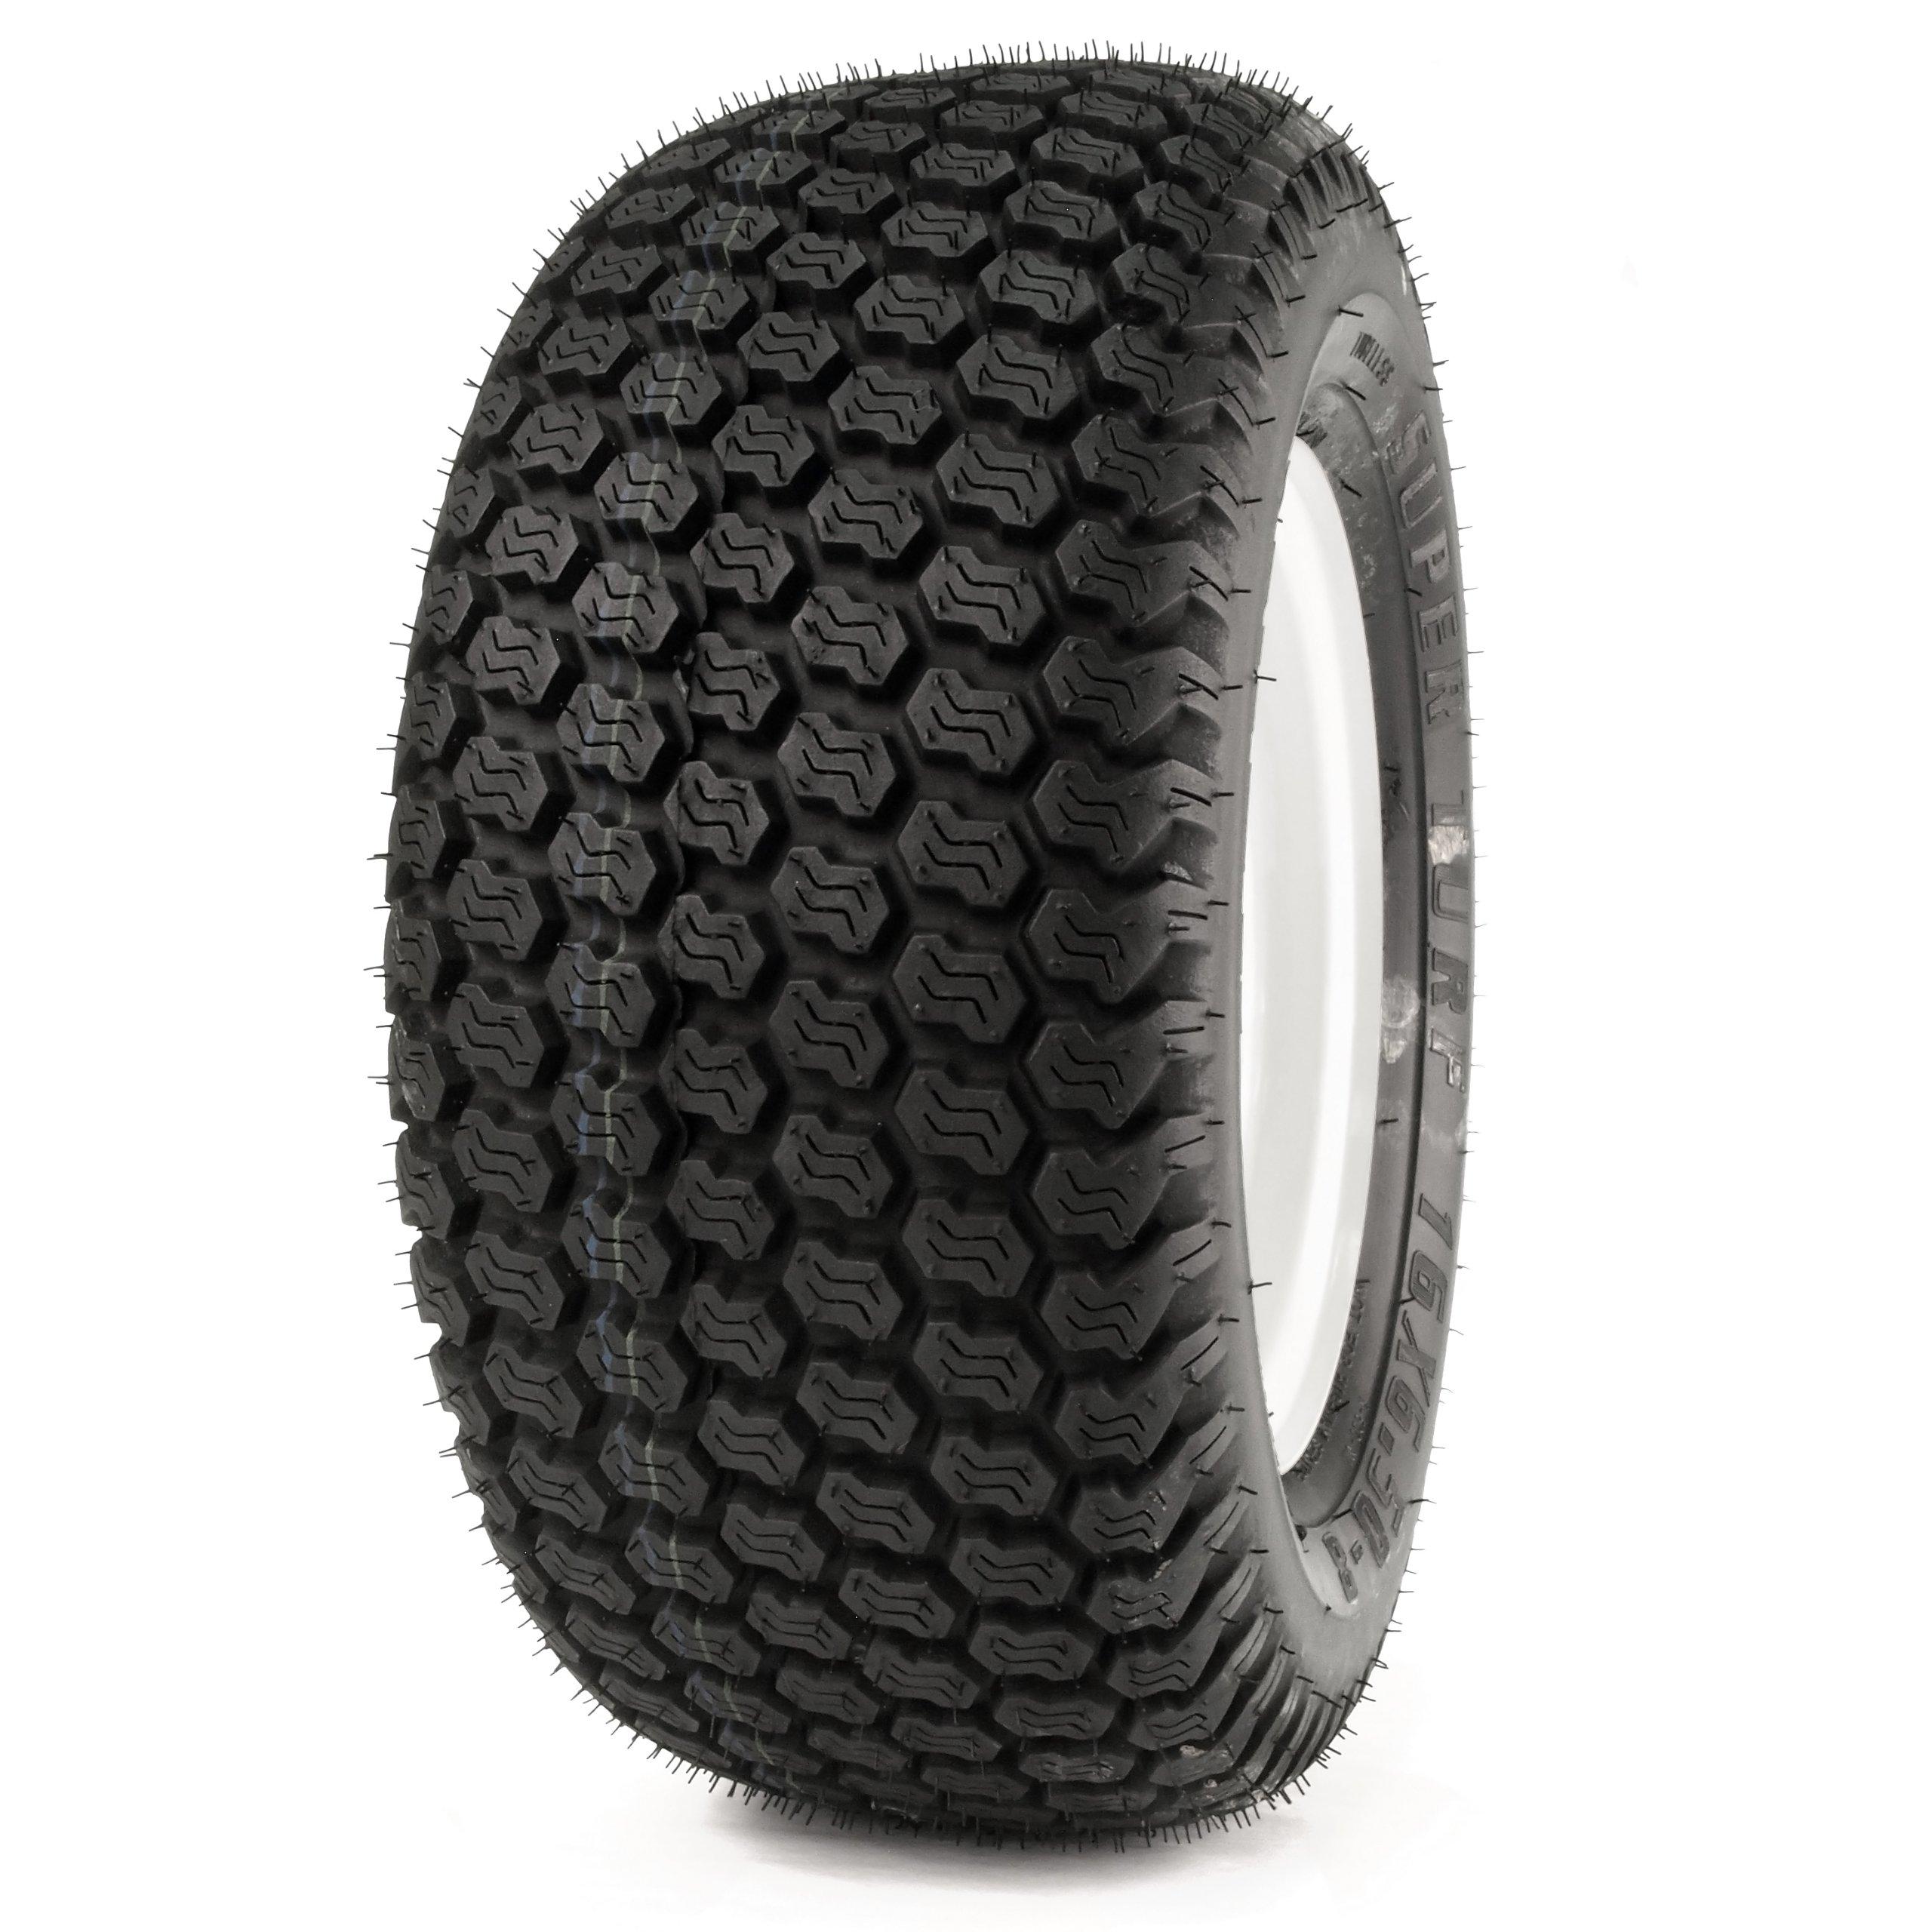 Kenda K500 Super Turf Lawn and Garden Bias Tire - 16/6.50-8